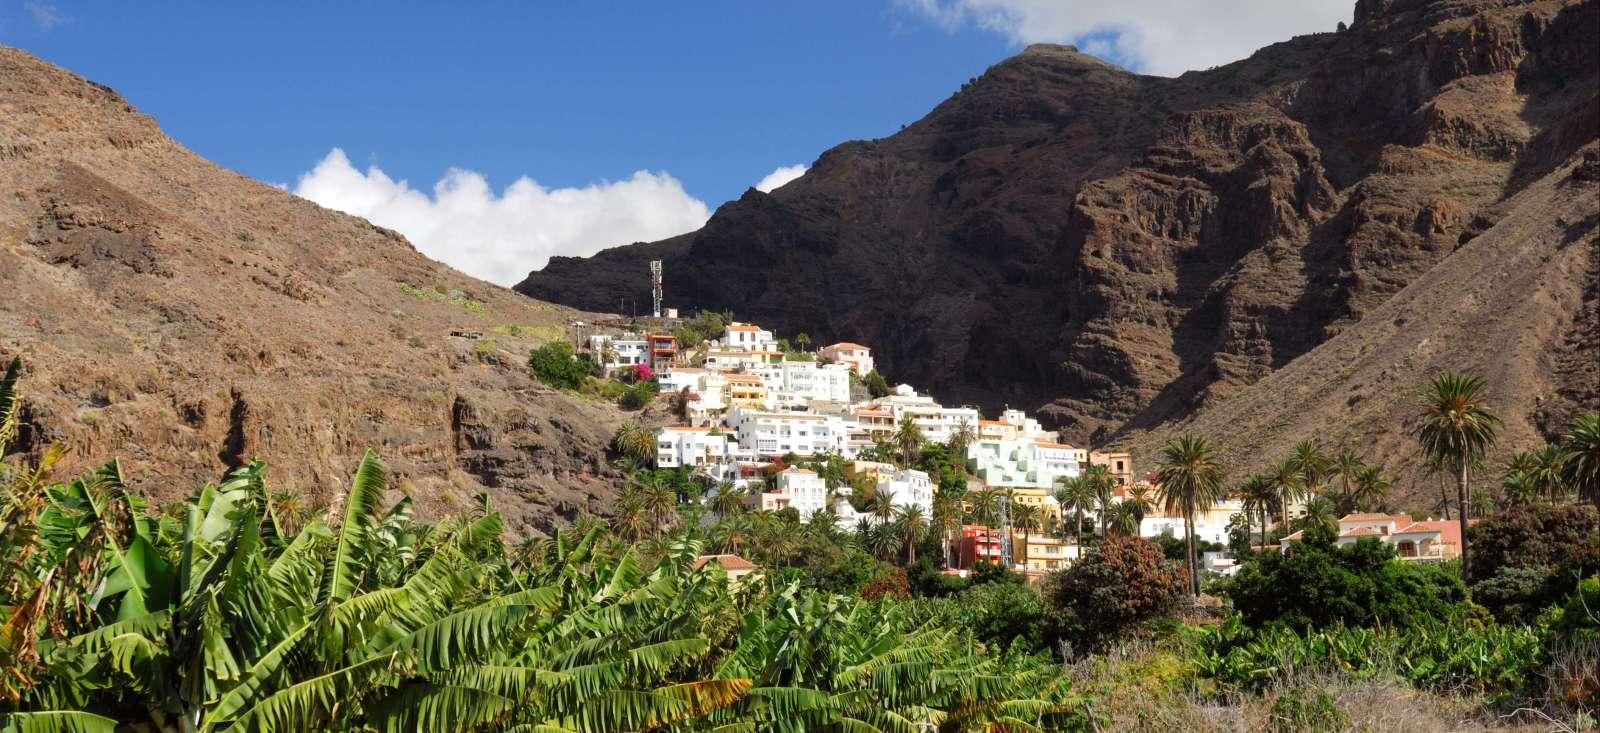 Voyage à pied : La Gomera, le jardin d\'Eden...